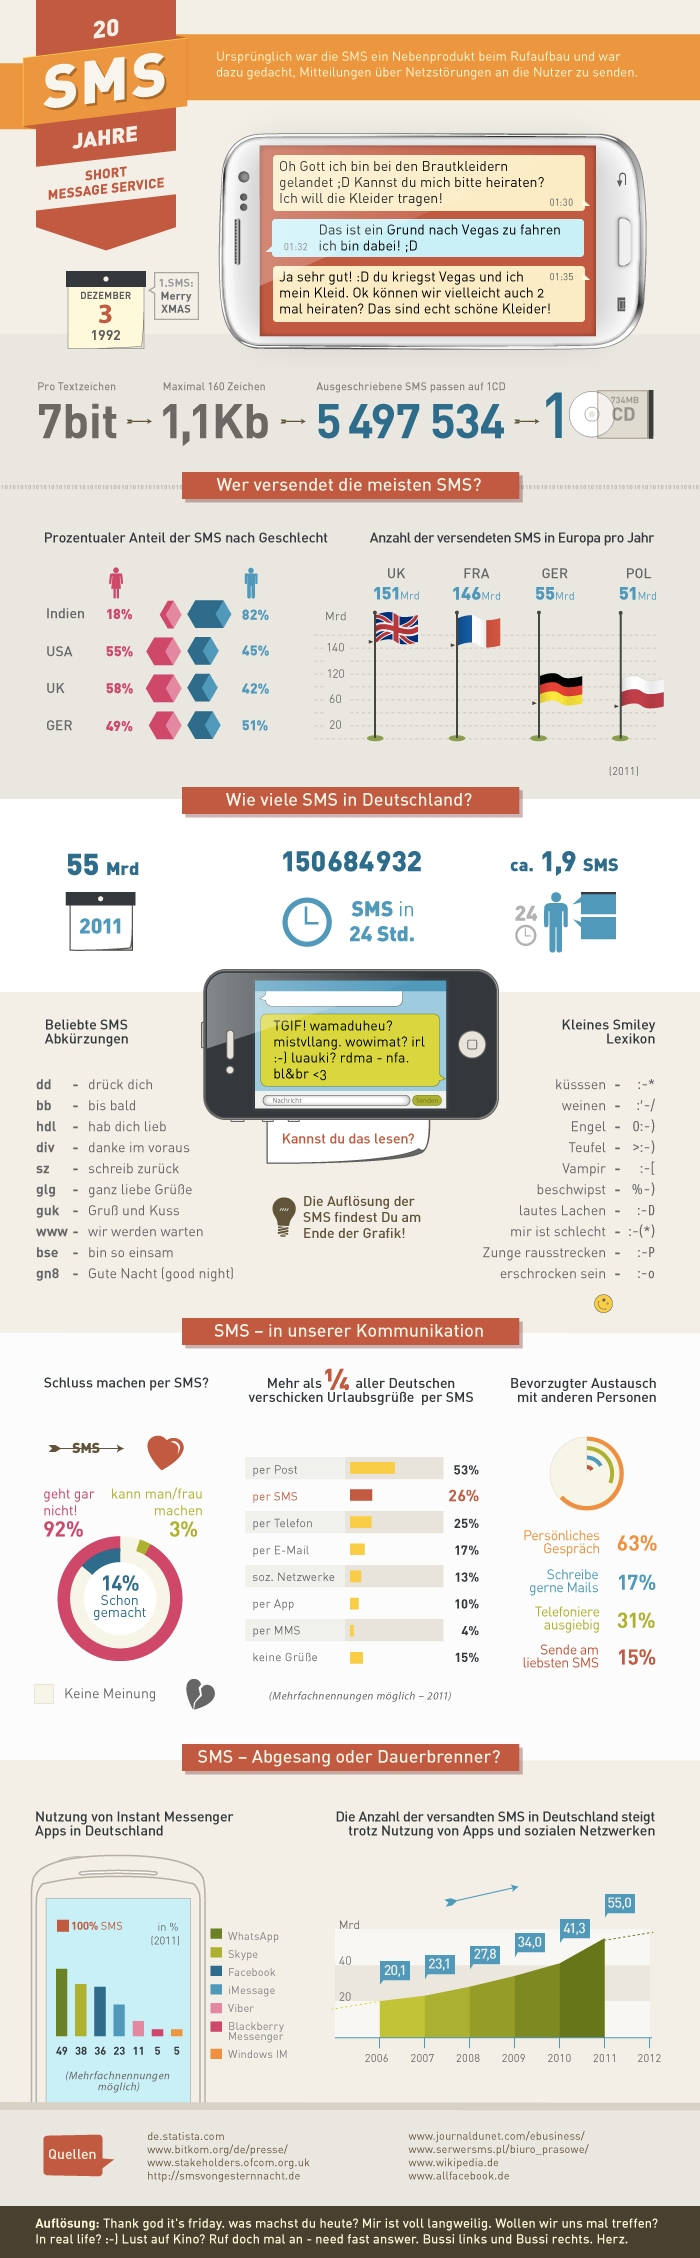 20_Jahre_SMS_Infografik